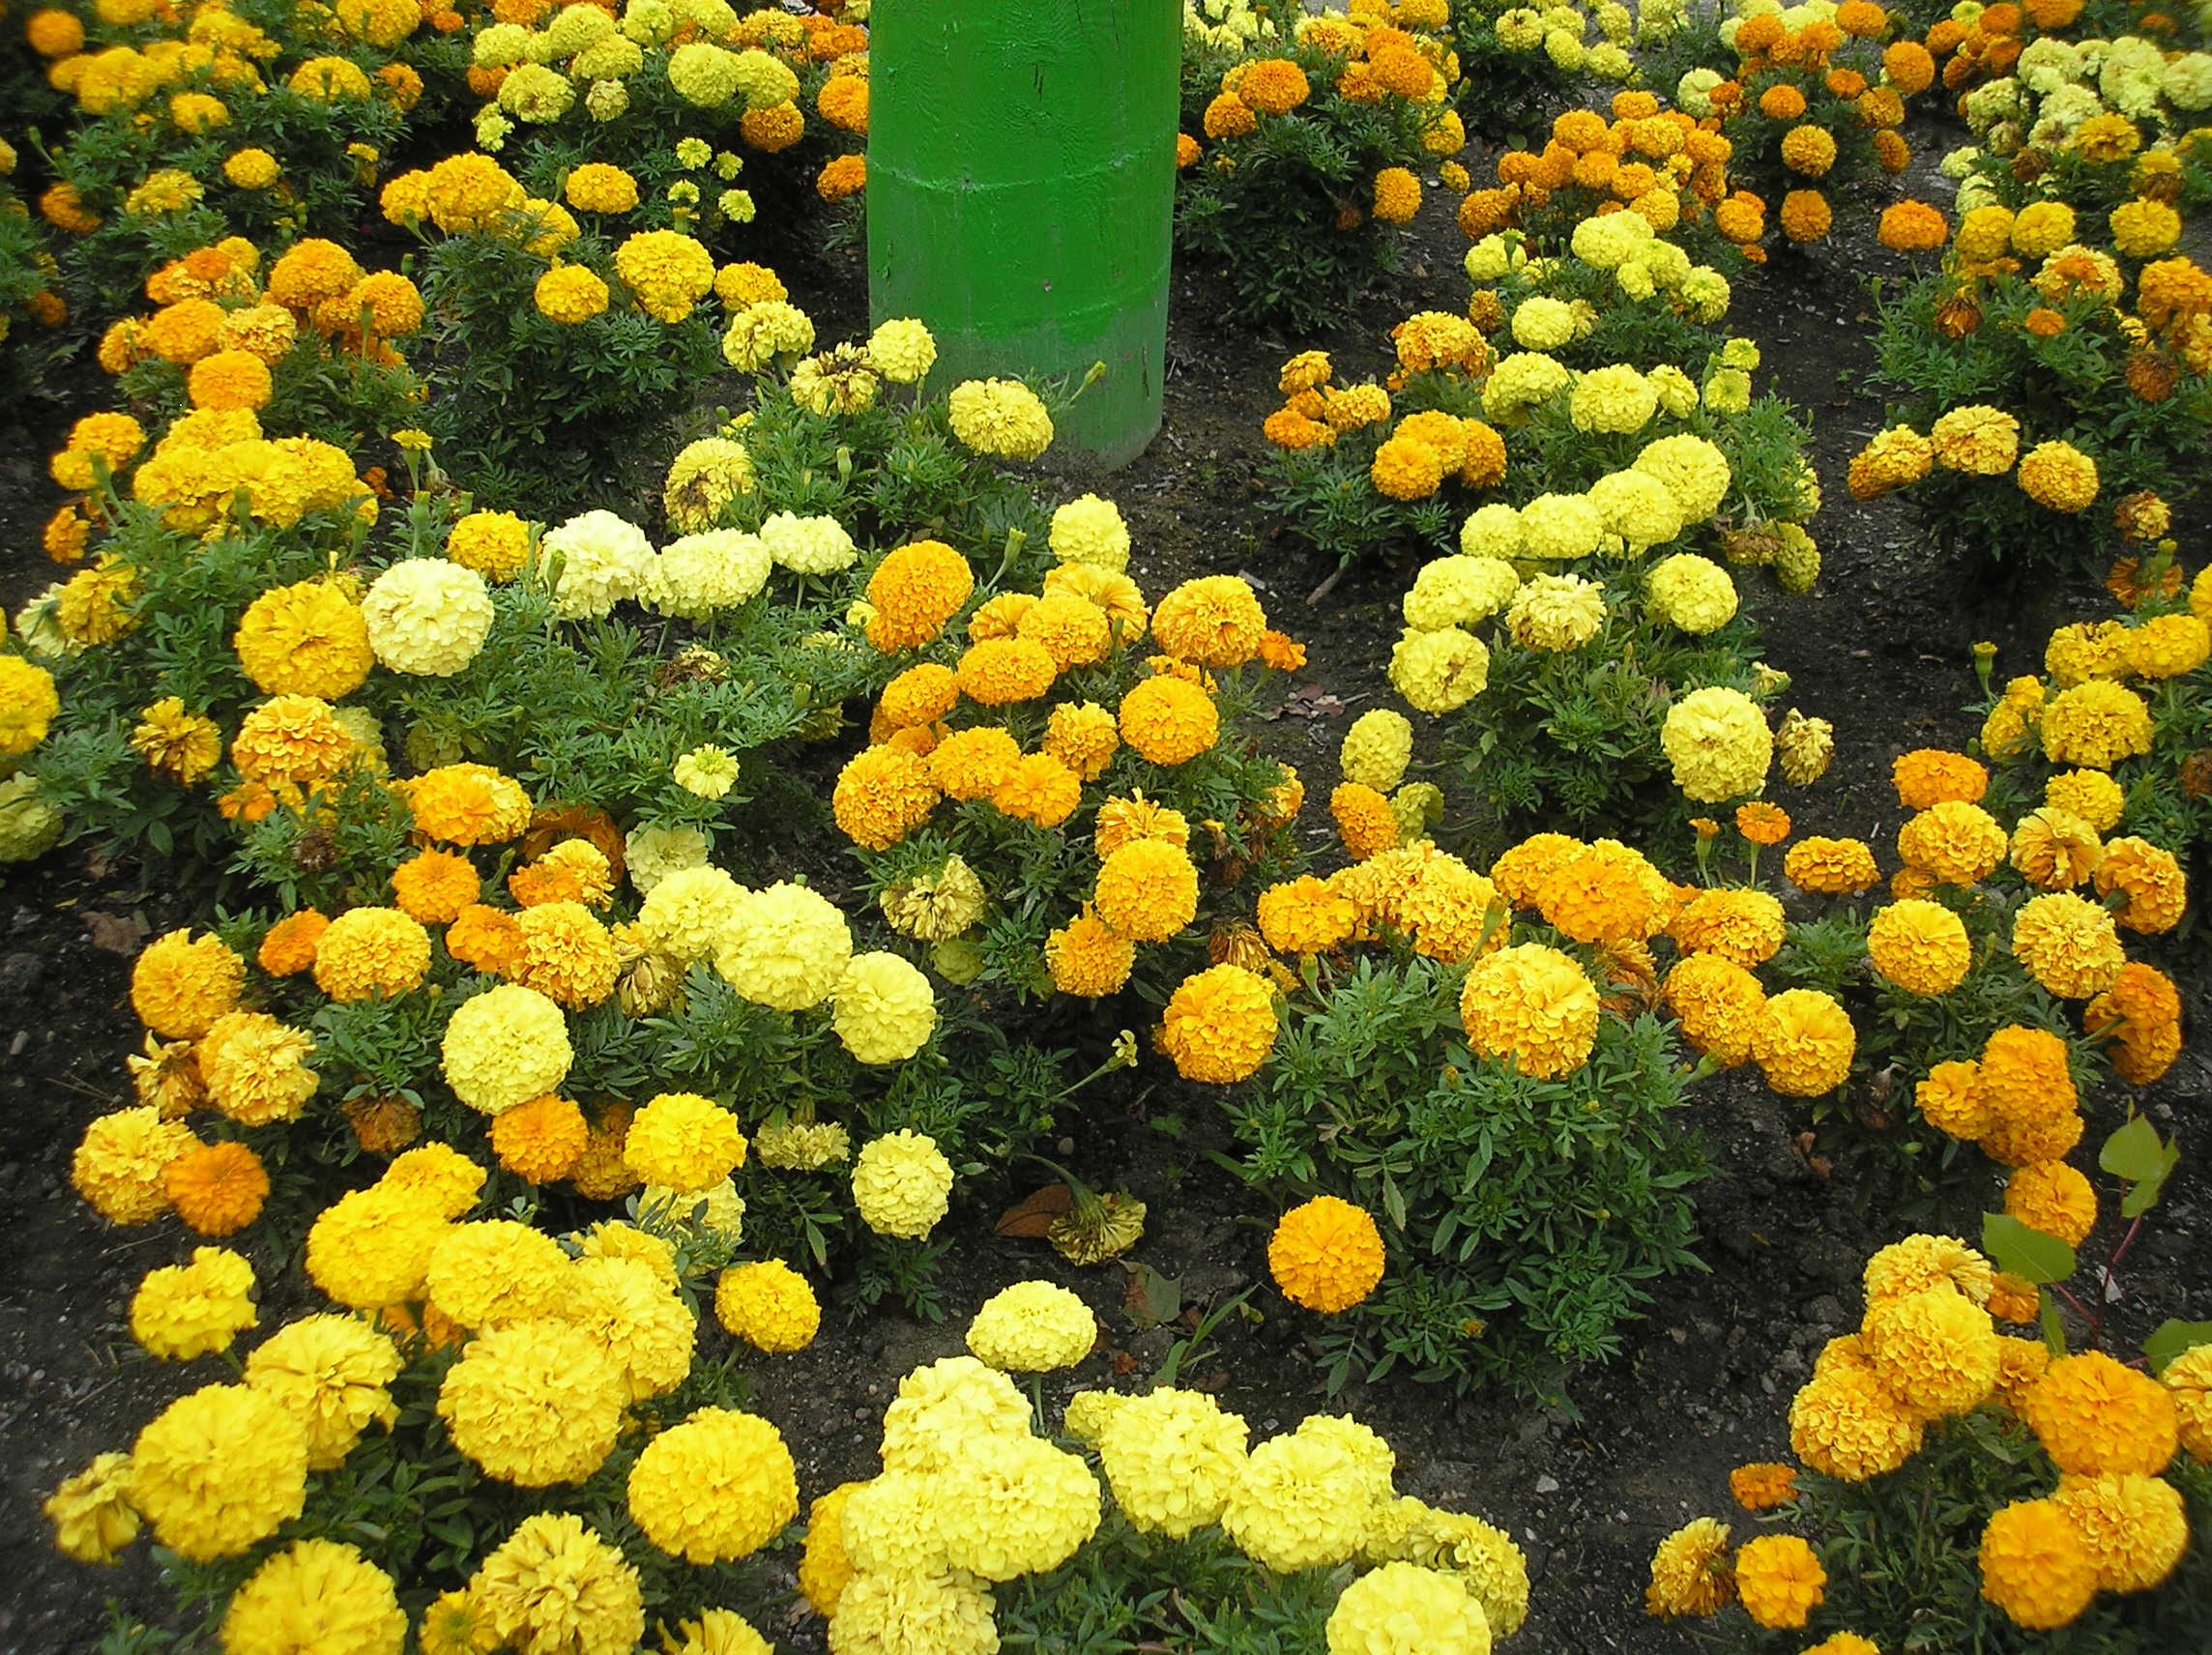 Fall Flowers - mums